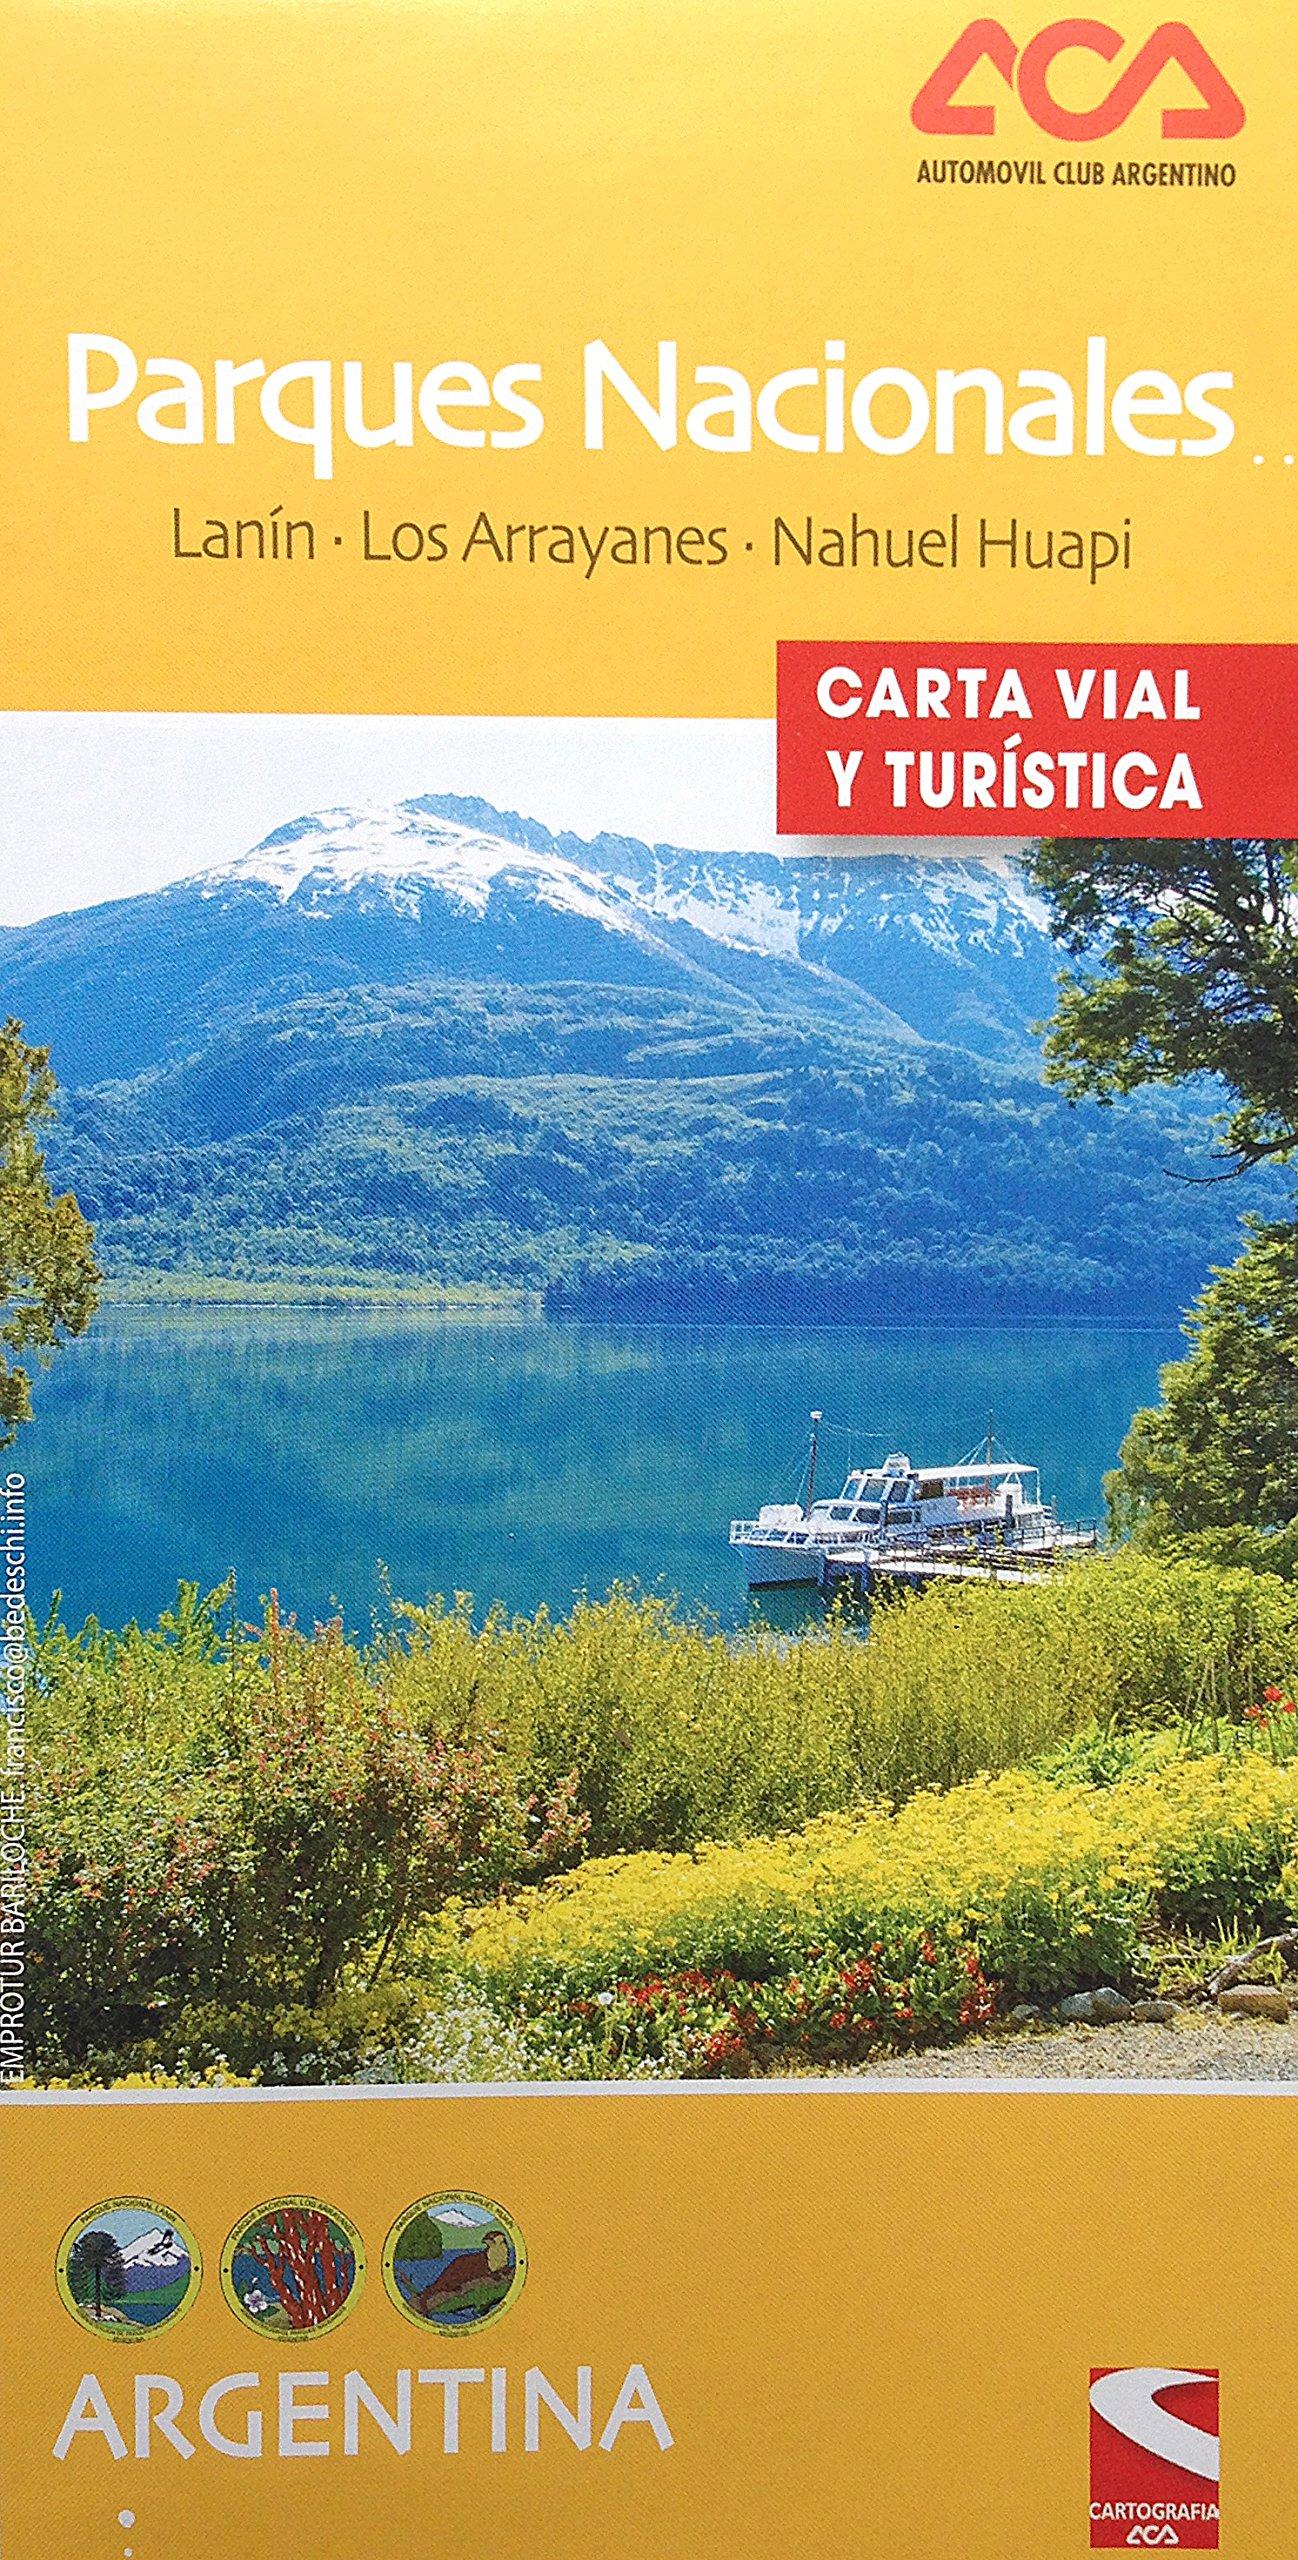 Parques Nacionales Argentina Map (Lanin / Los Arrayanes / Nahuel Huapi) (2015 Spanish Edition) PDF